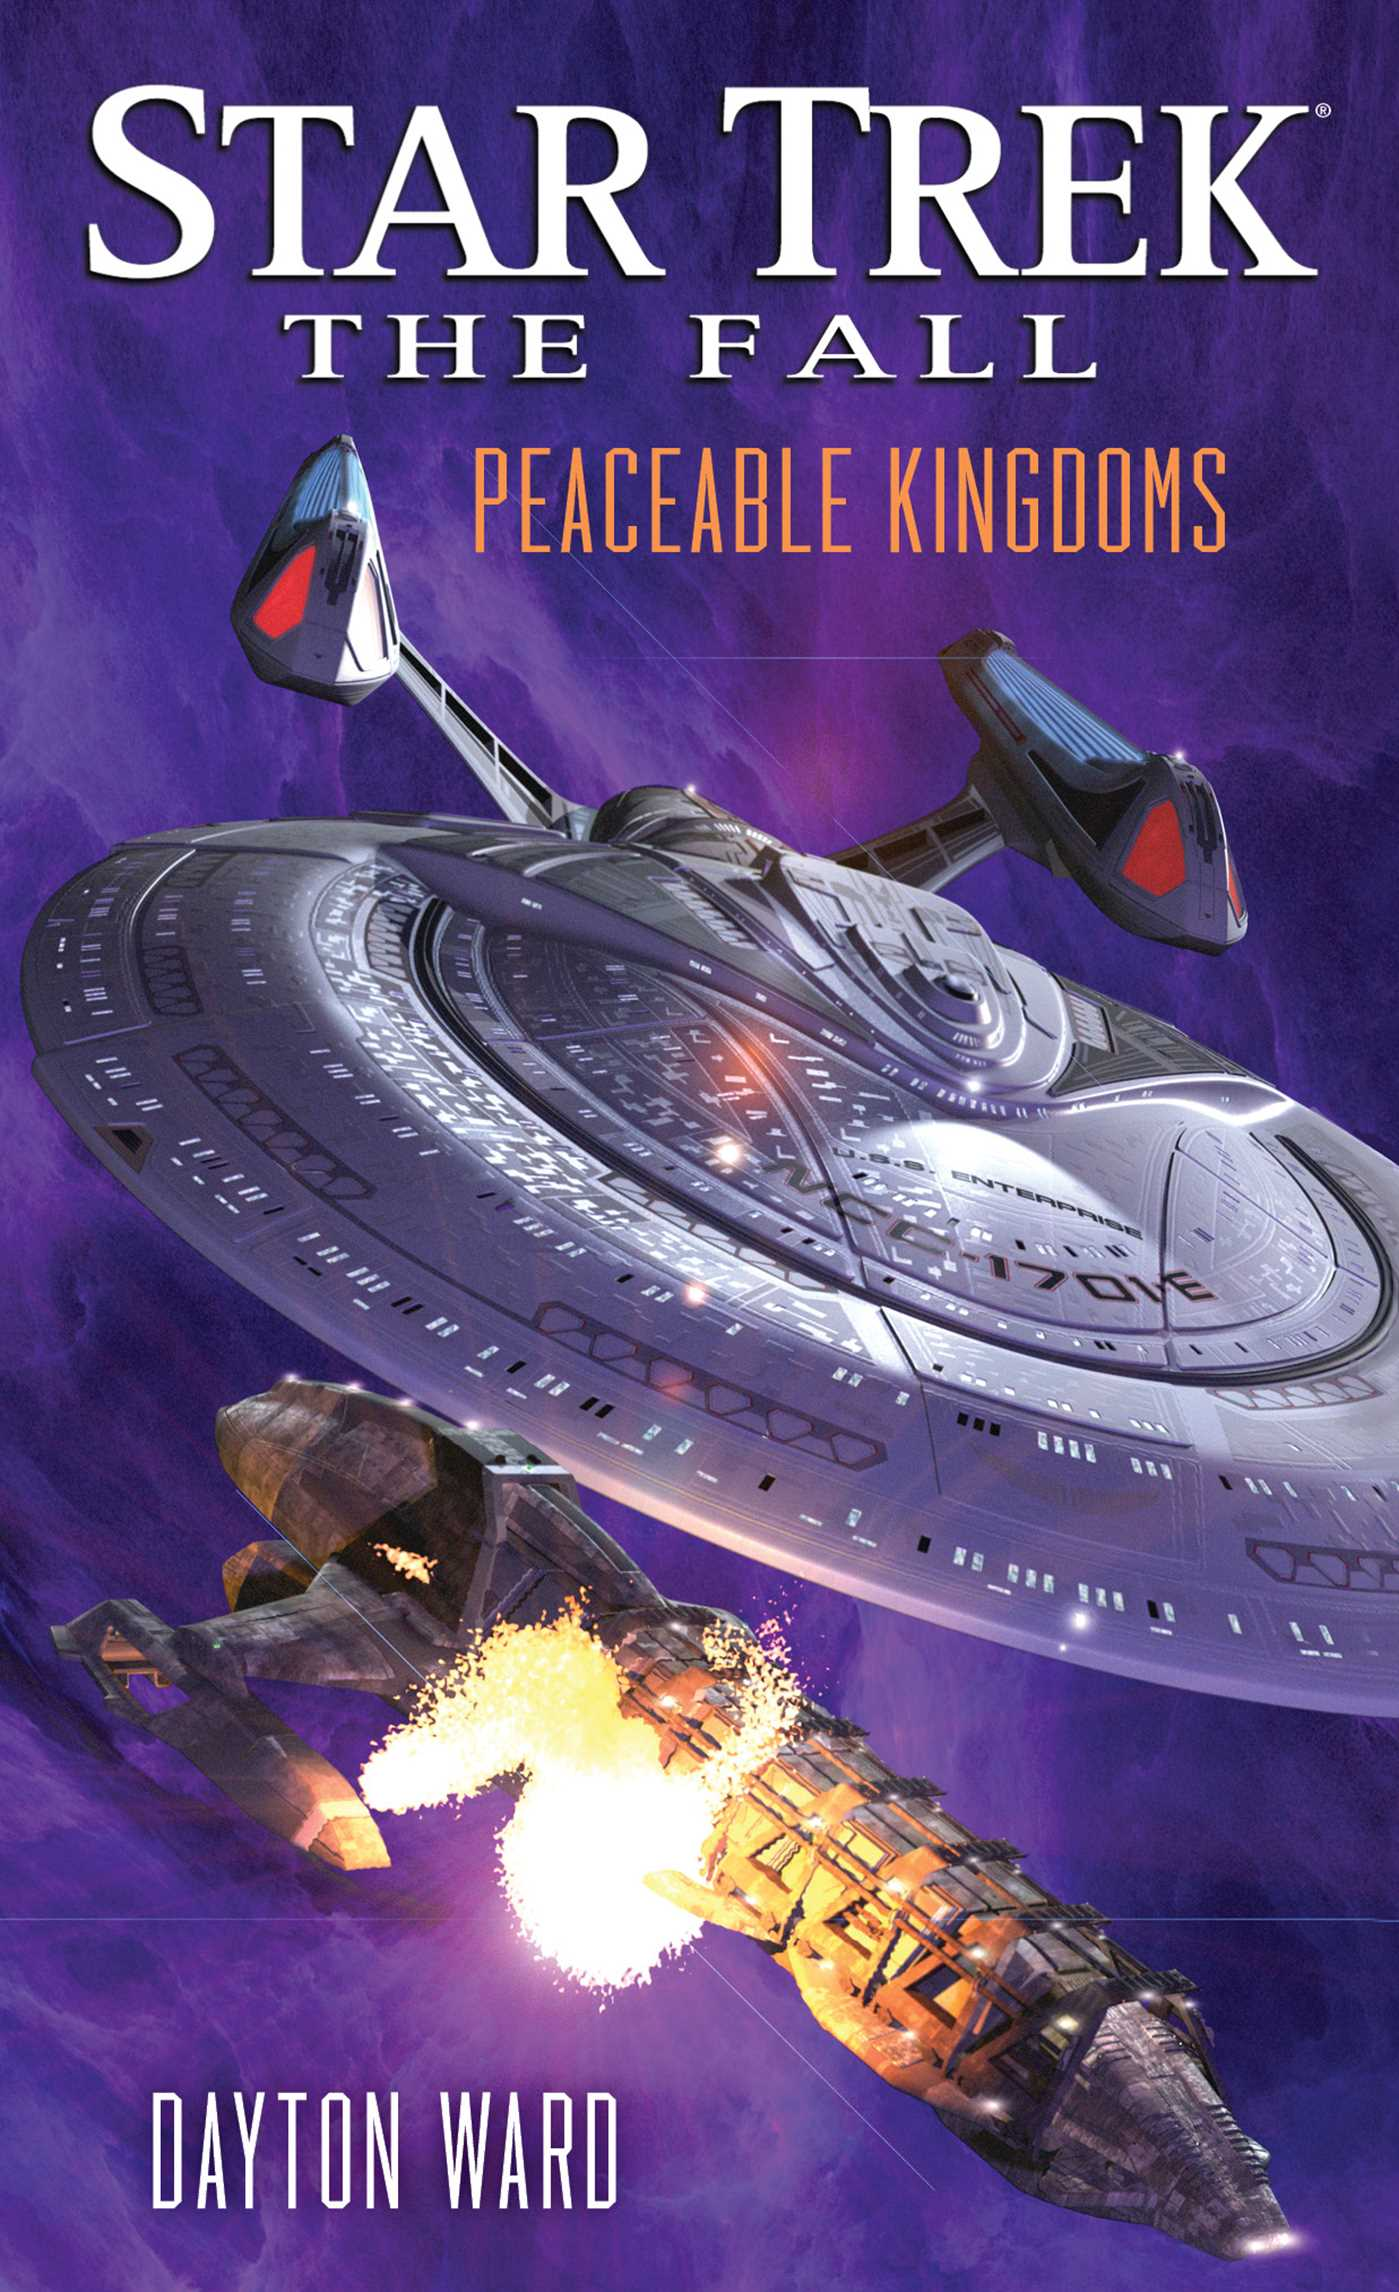 The fall peaceable kingdoms 9781476719023 hr